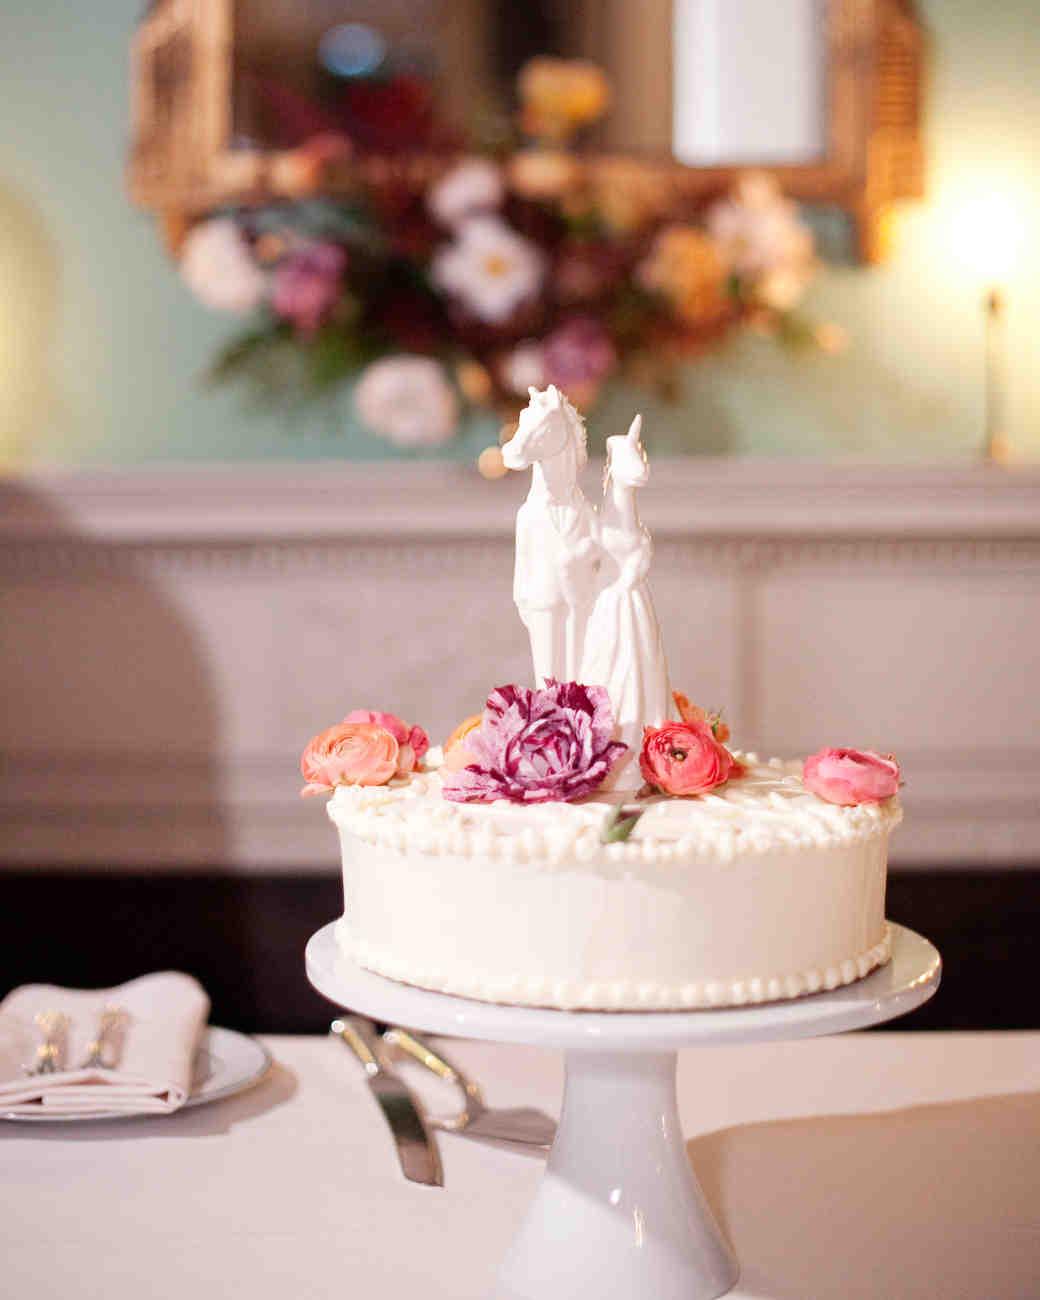 Boho-chic topper για τη γαμήλια τούρτα.